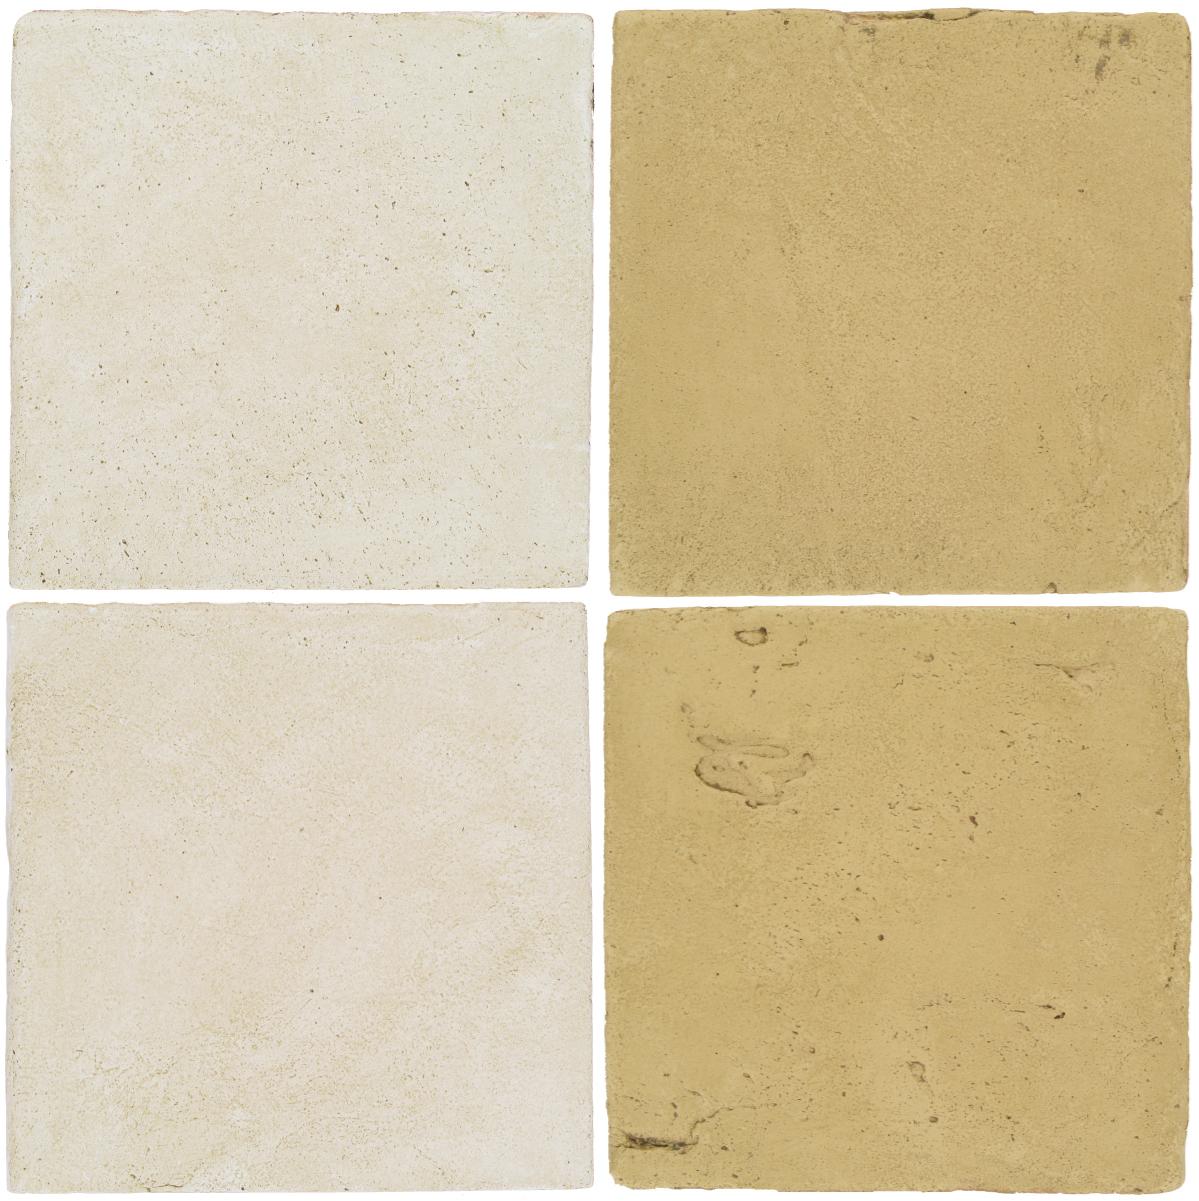 Pedralbes Antique Terracotta  2 Color Combinations  OHS-PGAW Antique White + VTG-PGGW Golden W.